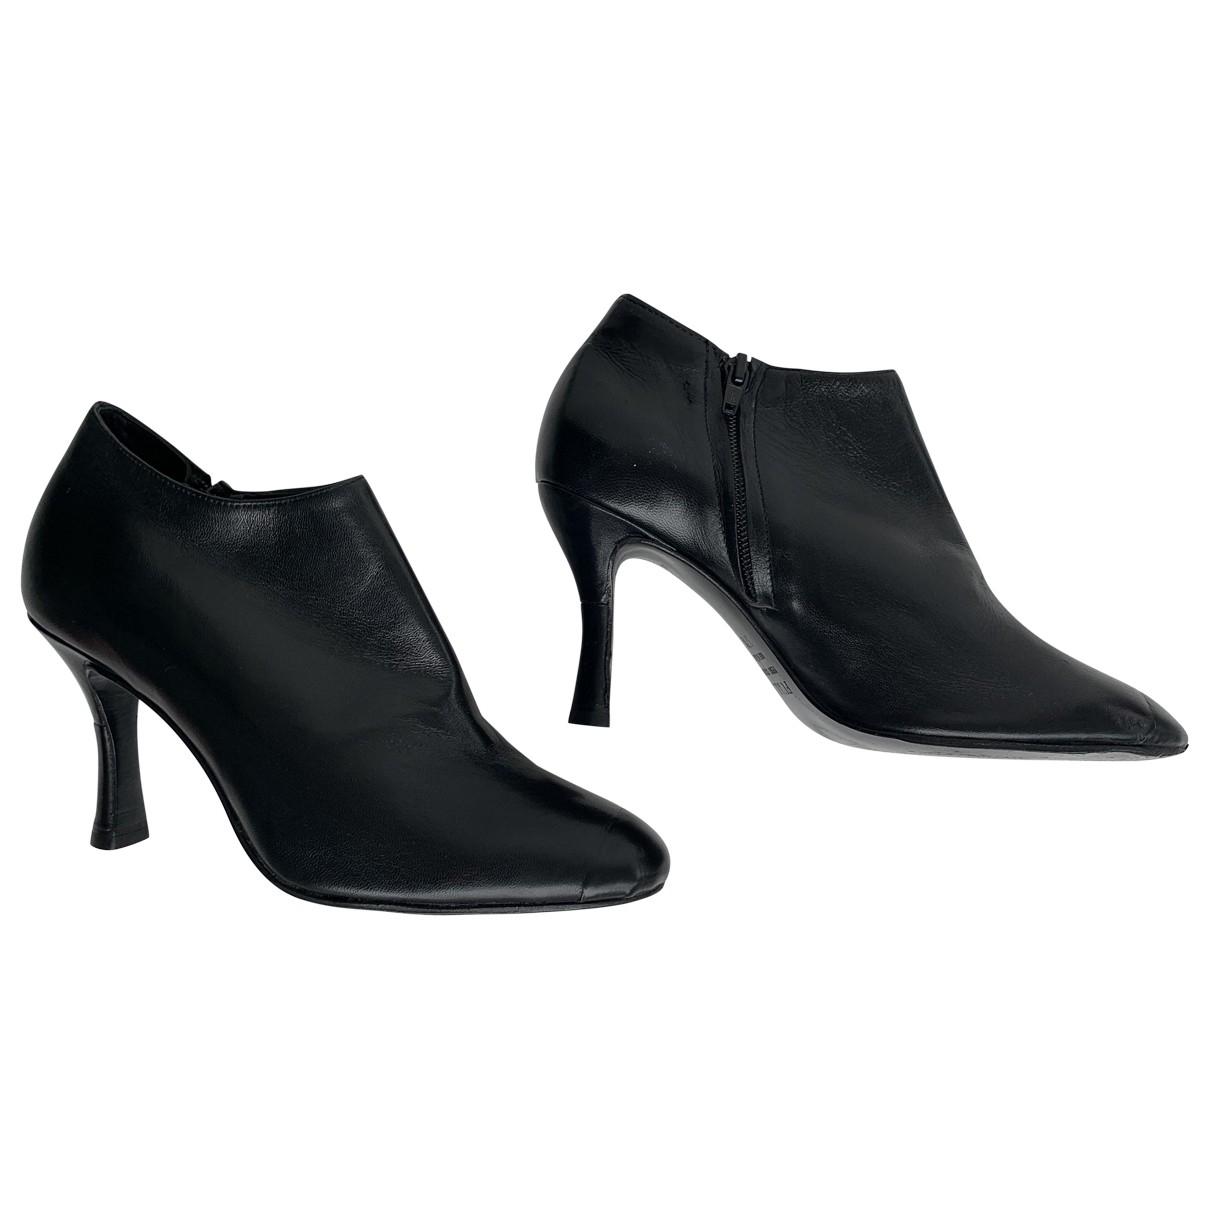 Furla \N Black Leather Heels for Women 37.5 EU